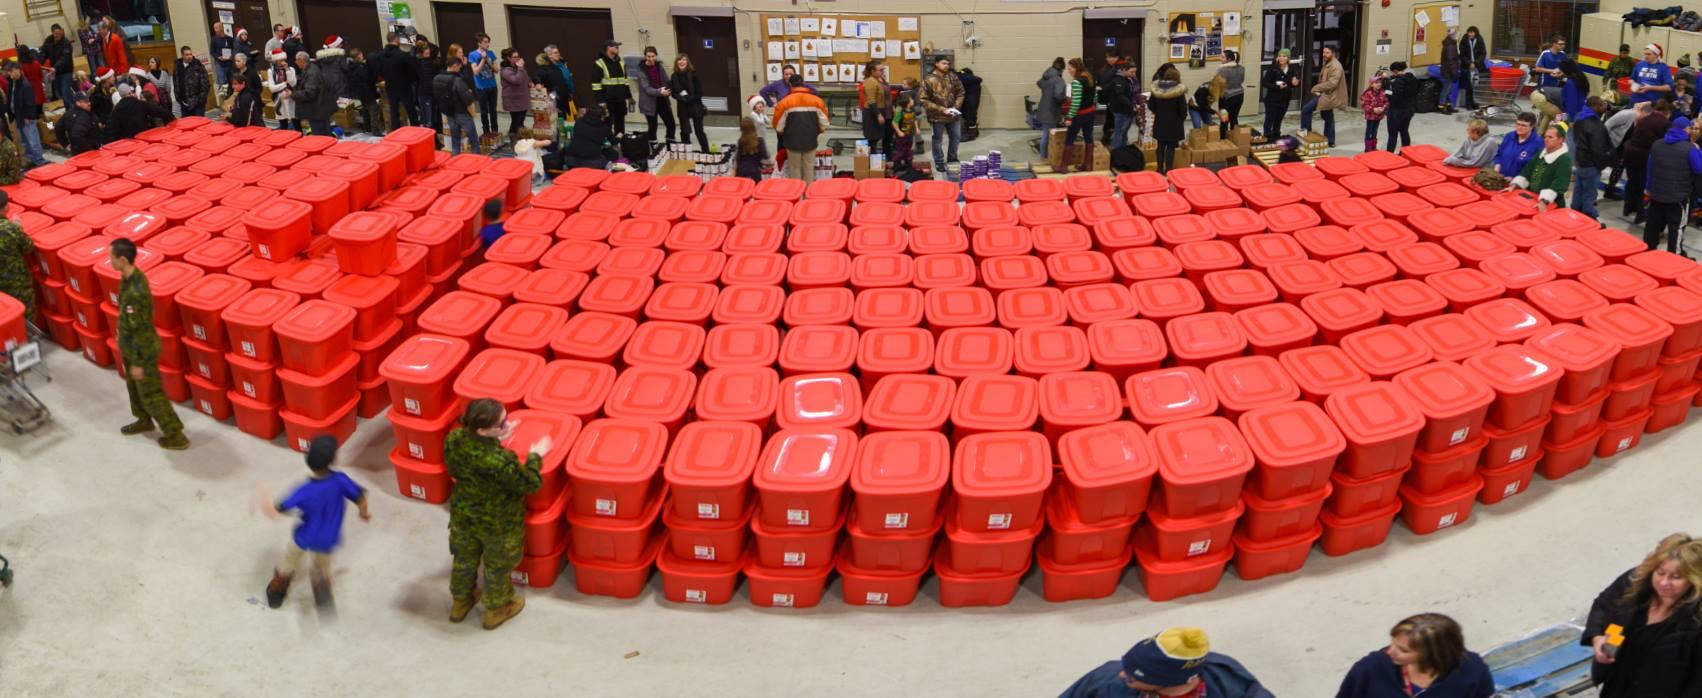 Santa Fund North Bay - Basket Packing Night Volunteers